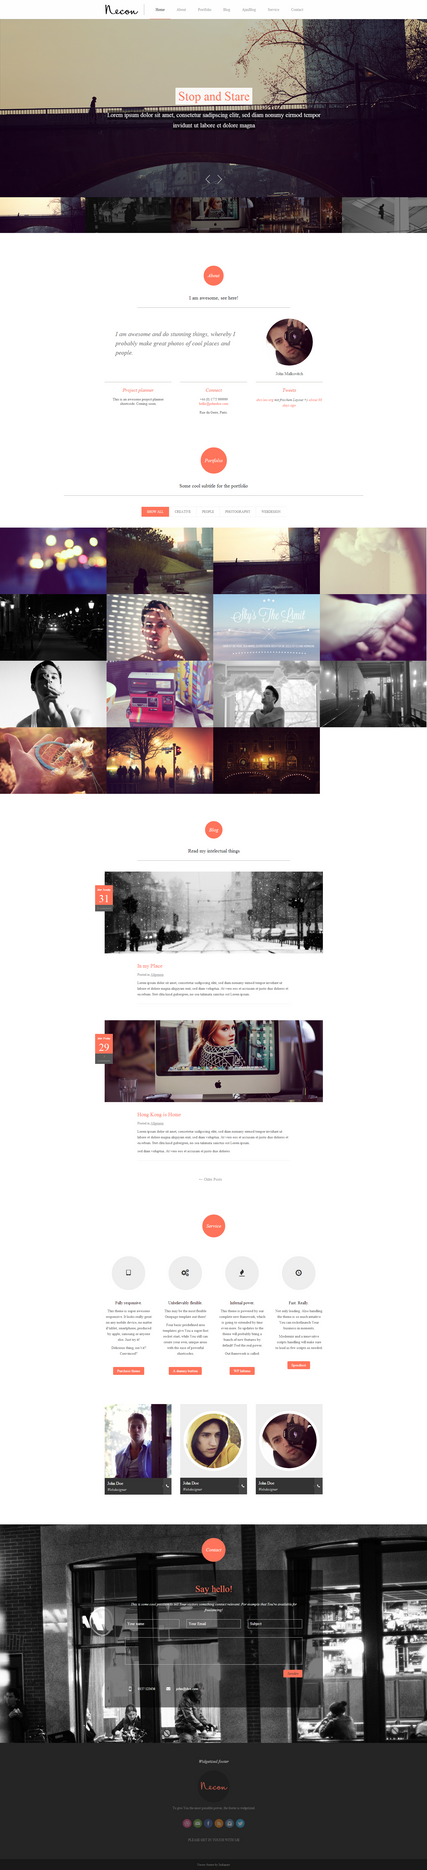 Necon a Responsive Onepage Wordpress Theme by the-webdesign